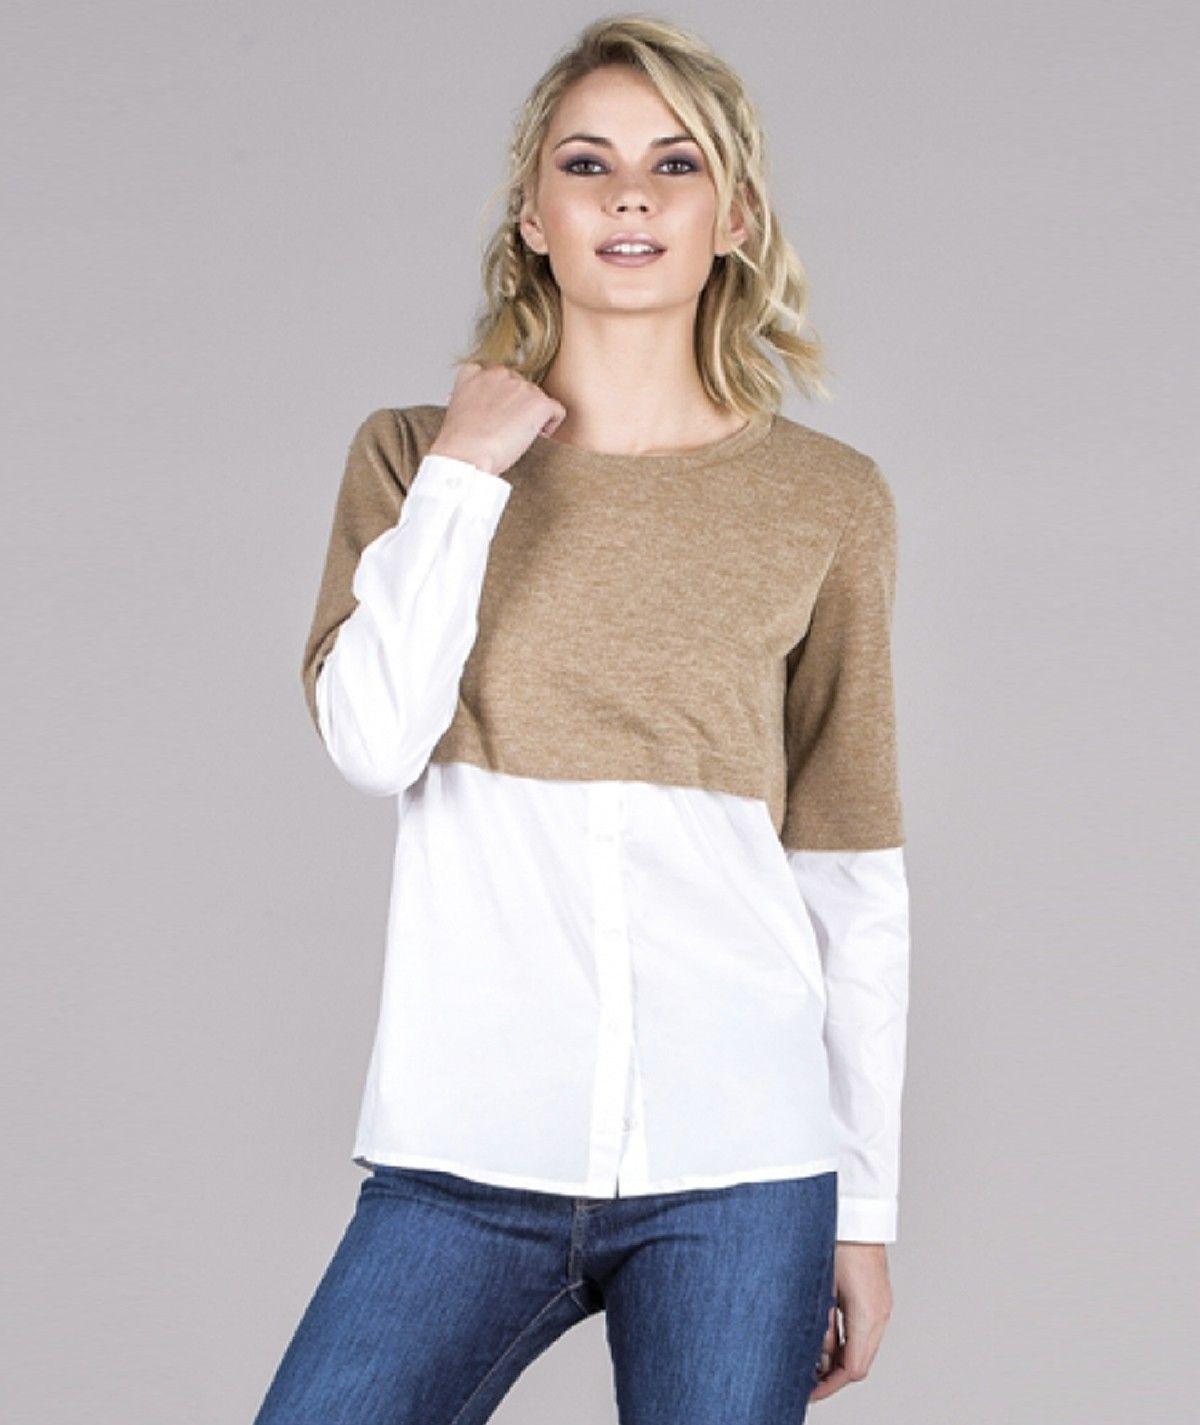 Camisola detalhe camisa